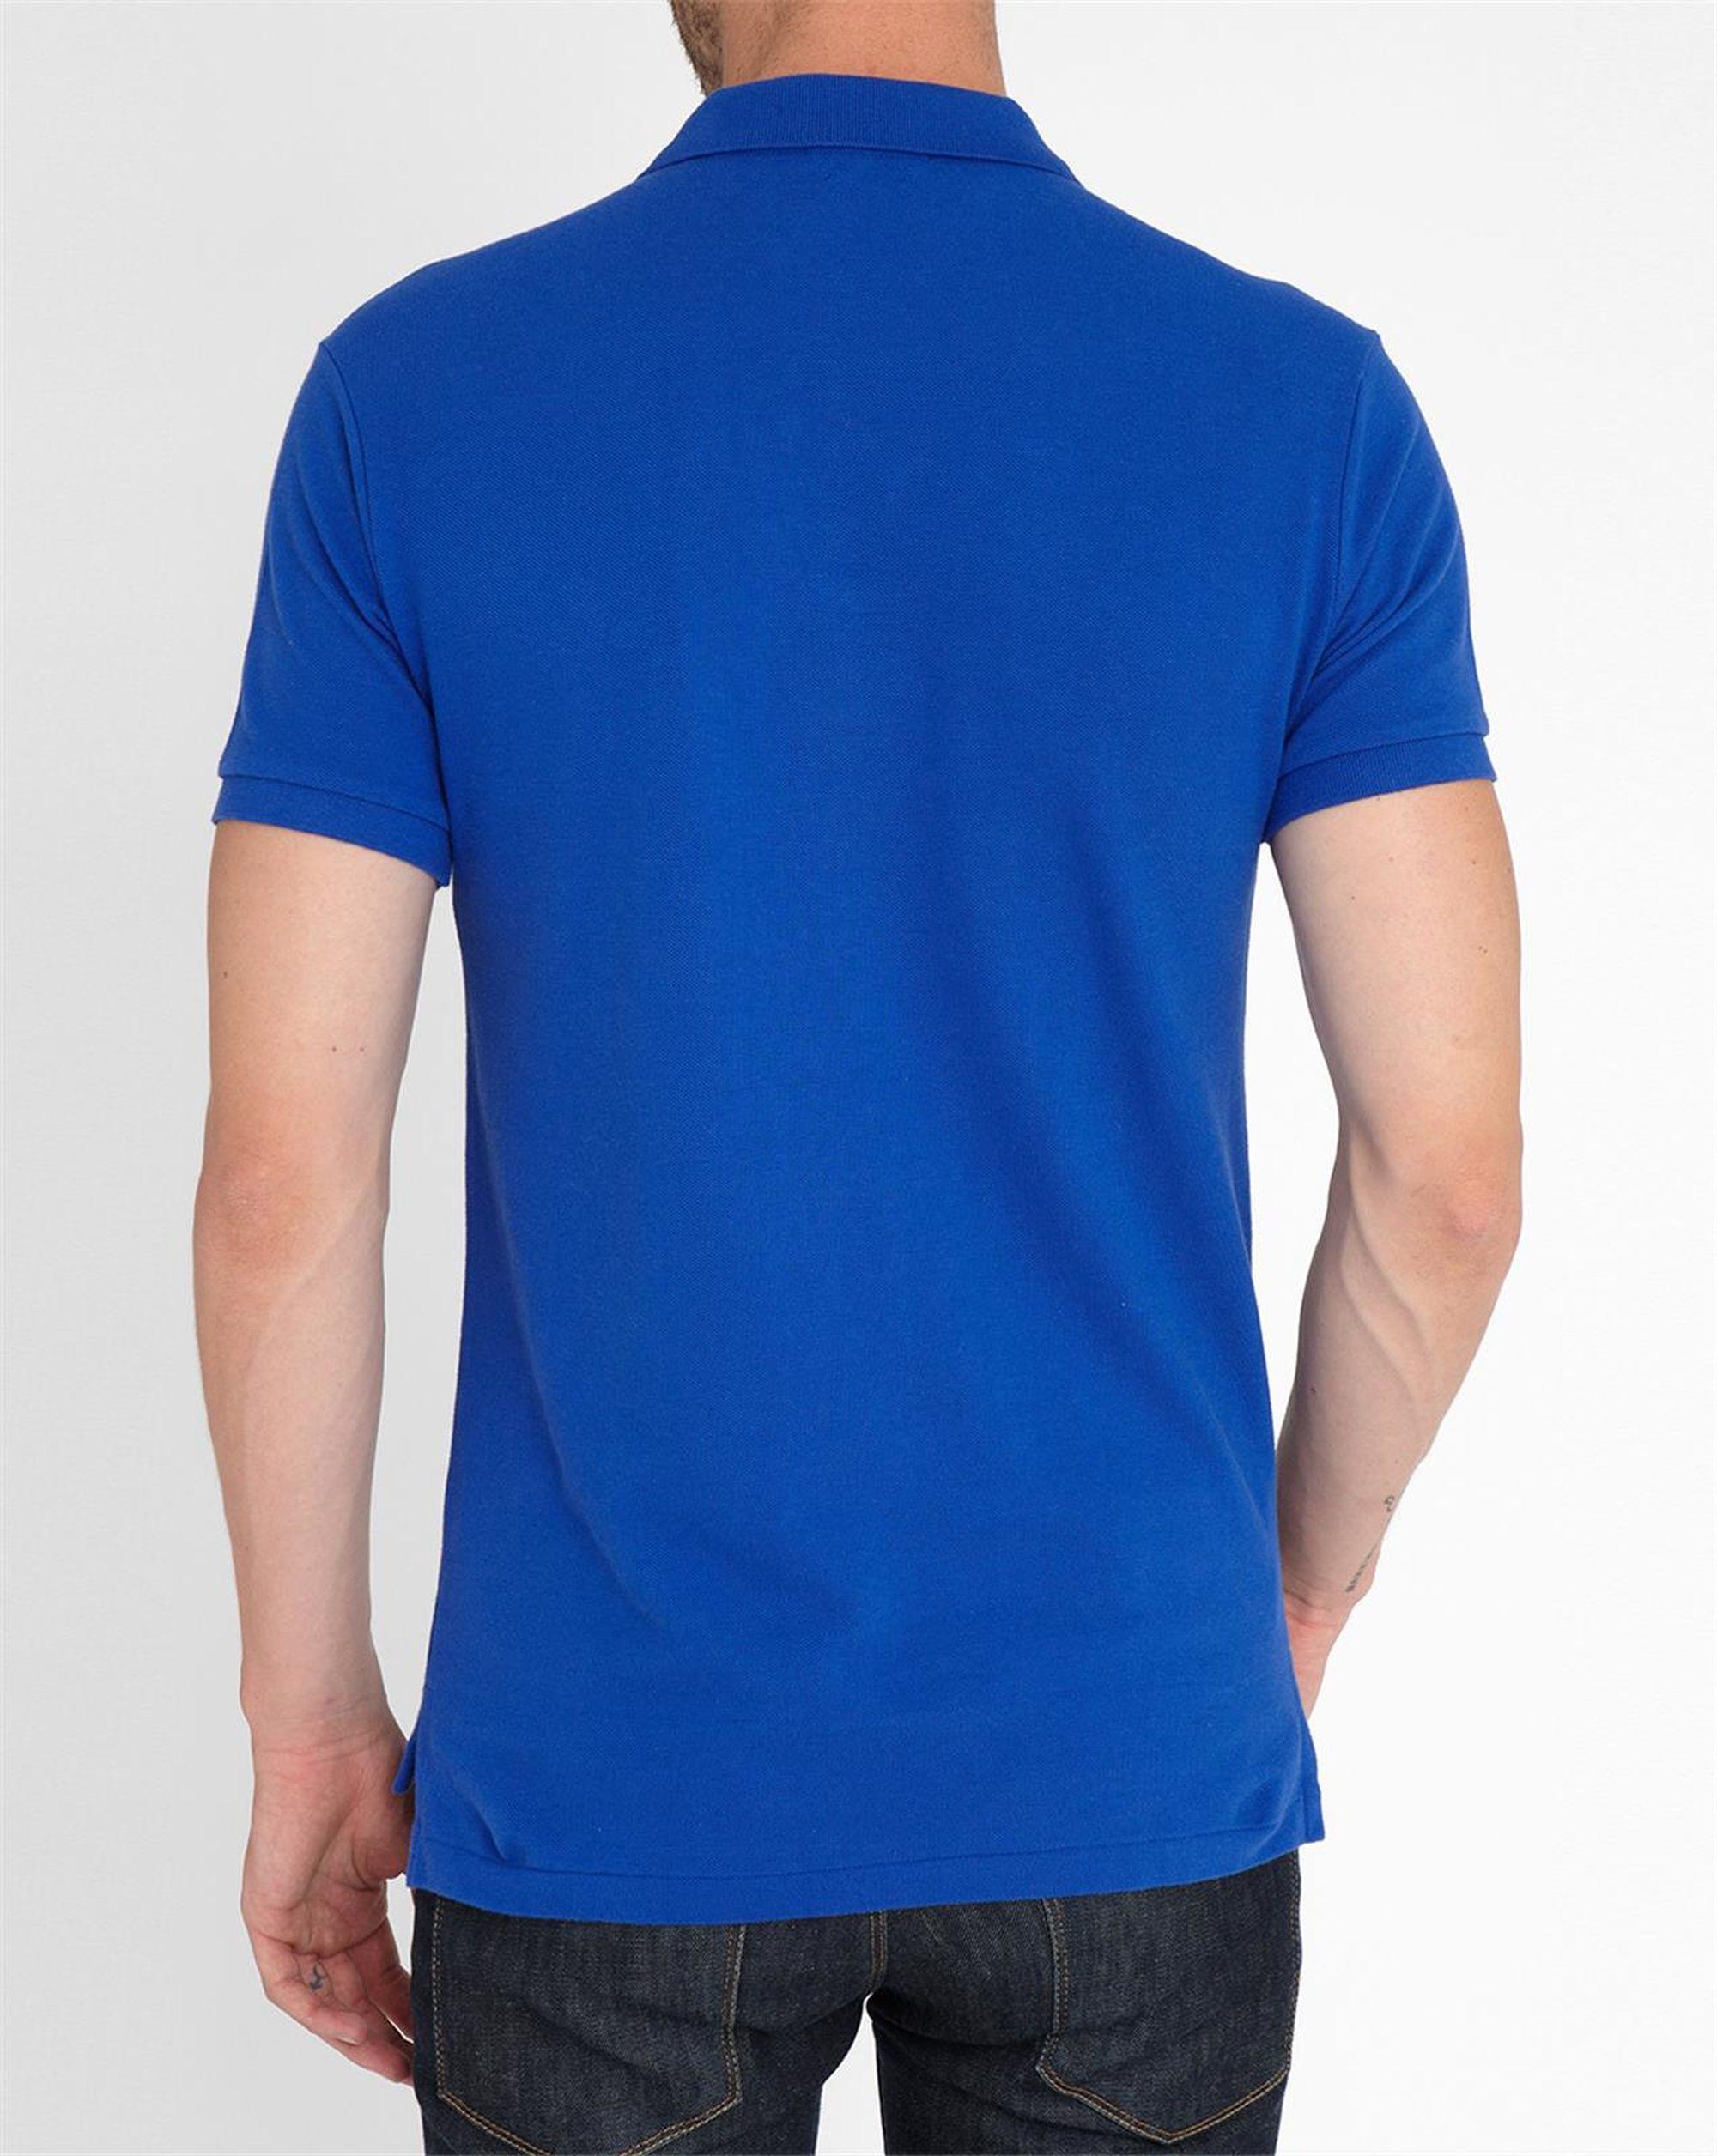 polo ralph lauren sapphire blue slim fit polo shirt in blue for men. Black Bedroom Furniture Sets. Home Design Ideas